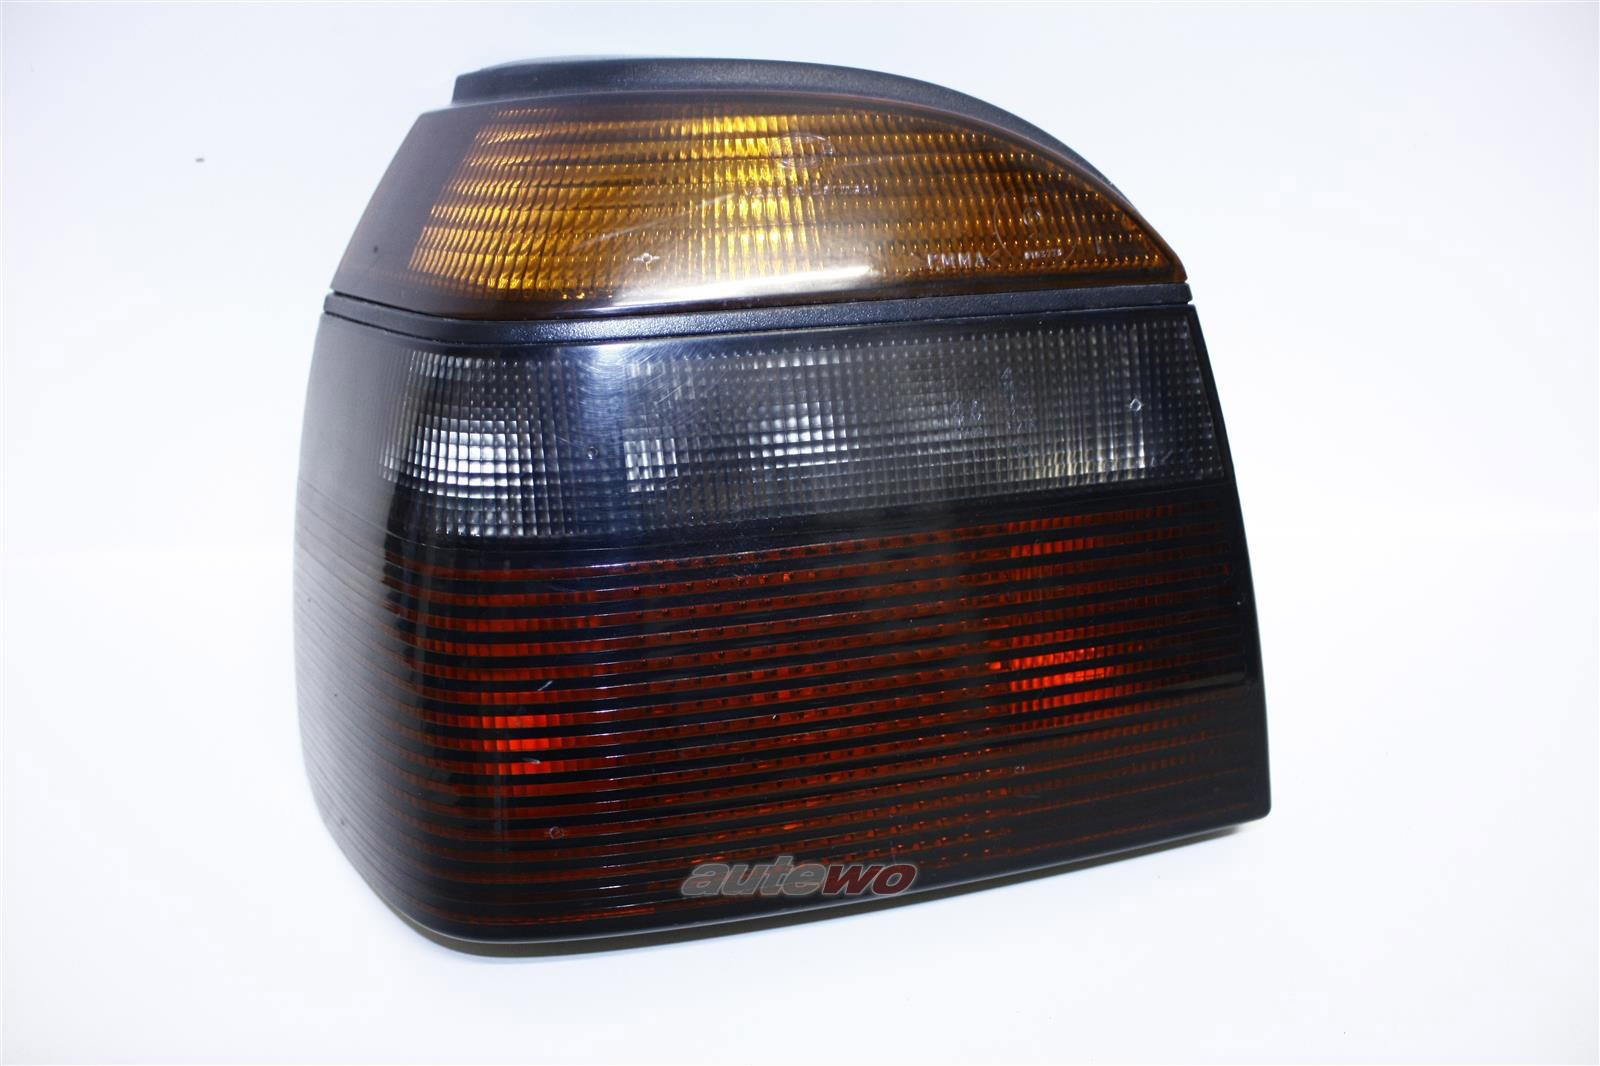 vw golf 3 r cklicht blinker links schwarz 1h6945111b ebay. Black Bedroom Furniture Sets. Home Design Ideas